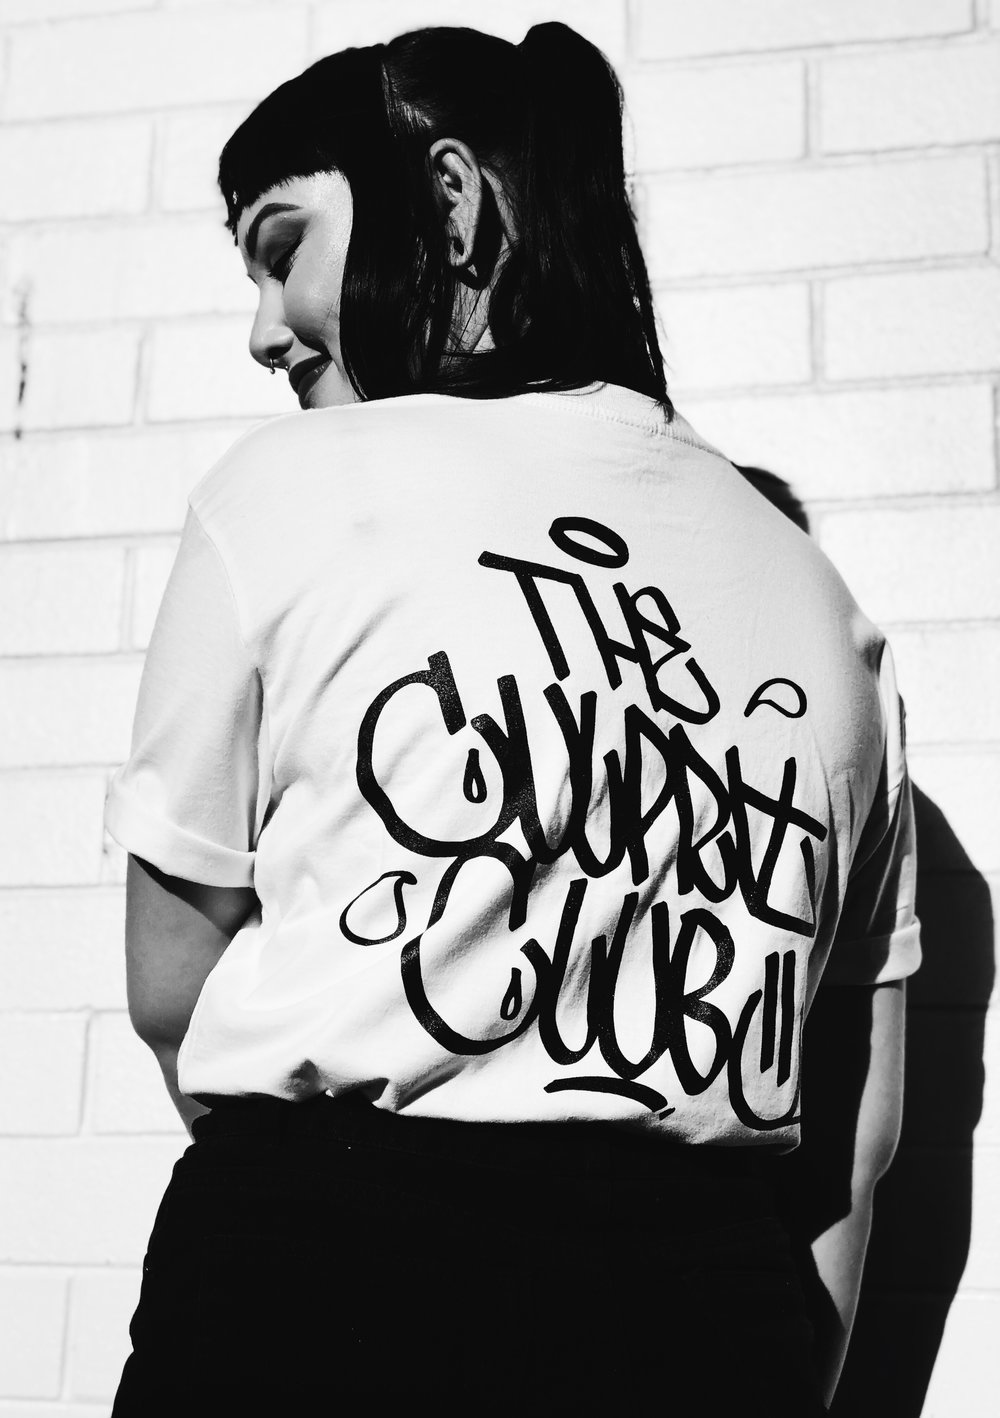 Culprit-Club-Daisy-Wong-3-Culprit-Crew